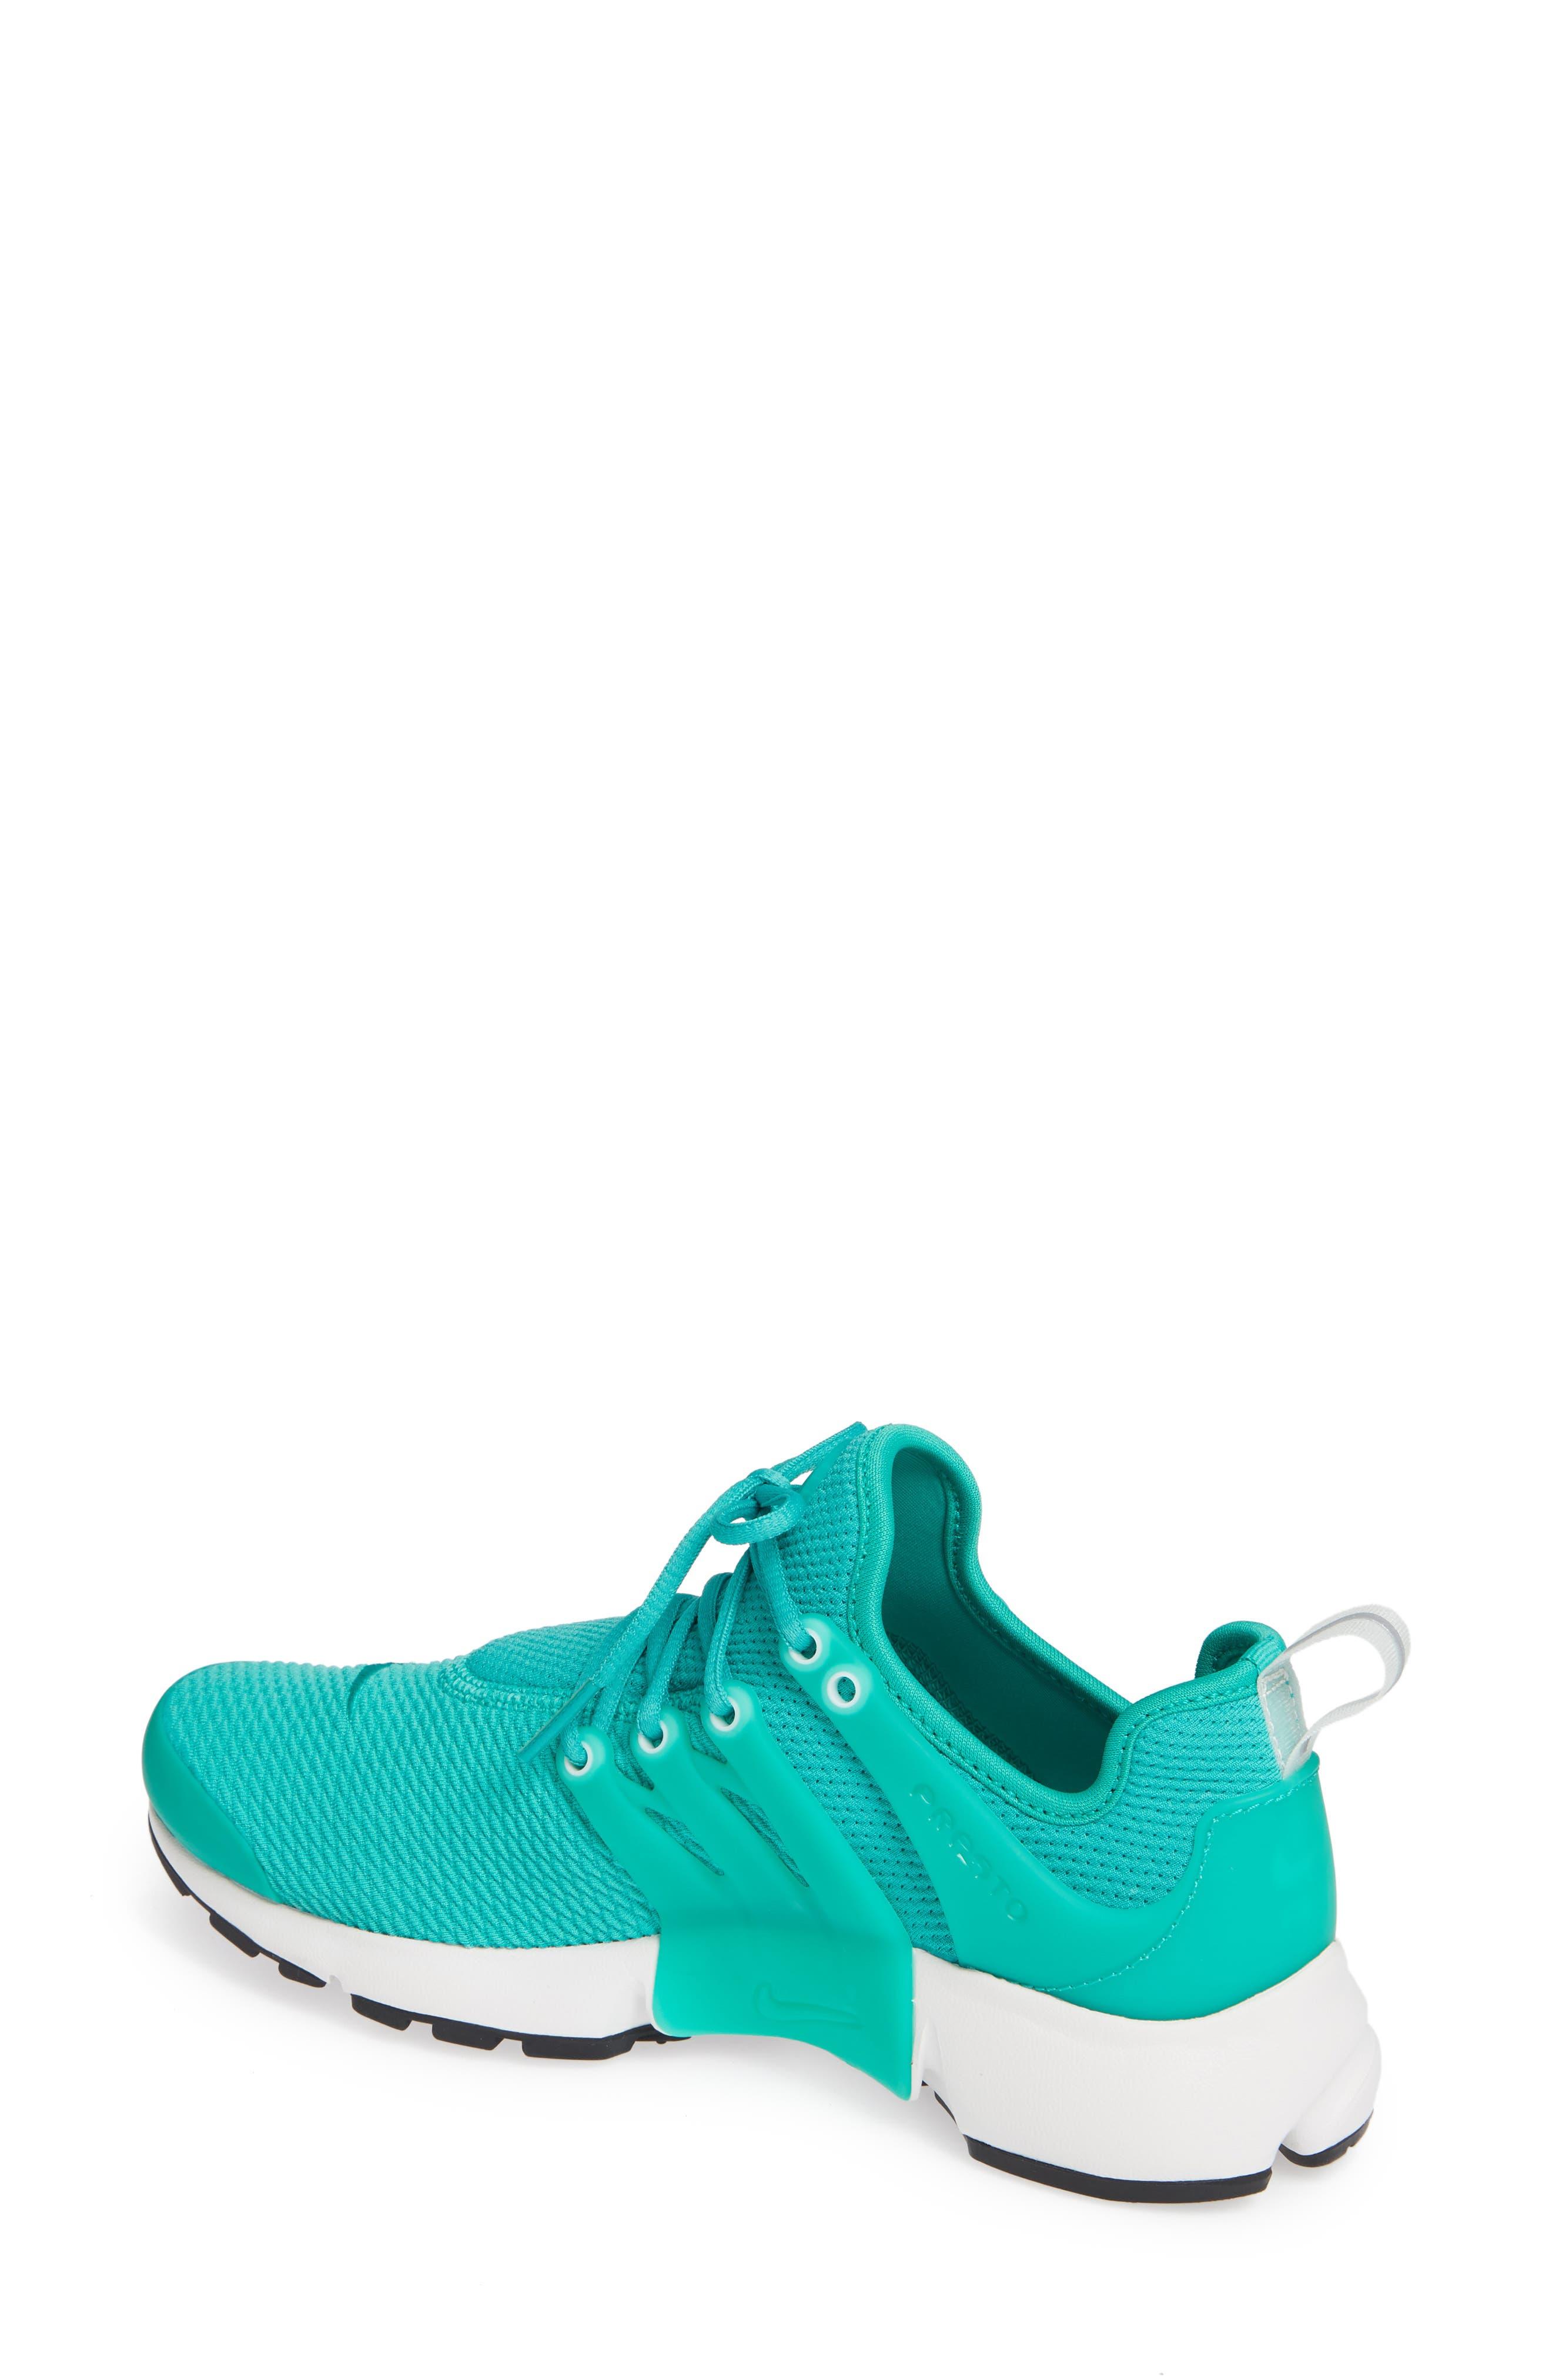 Air Presto Sneaker,                             Alternate thumbnail 2, color,                             Clear Emerald/ Summit White